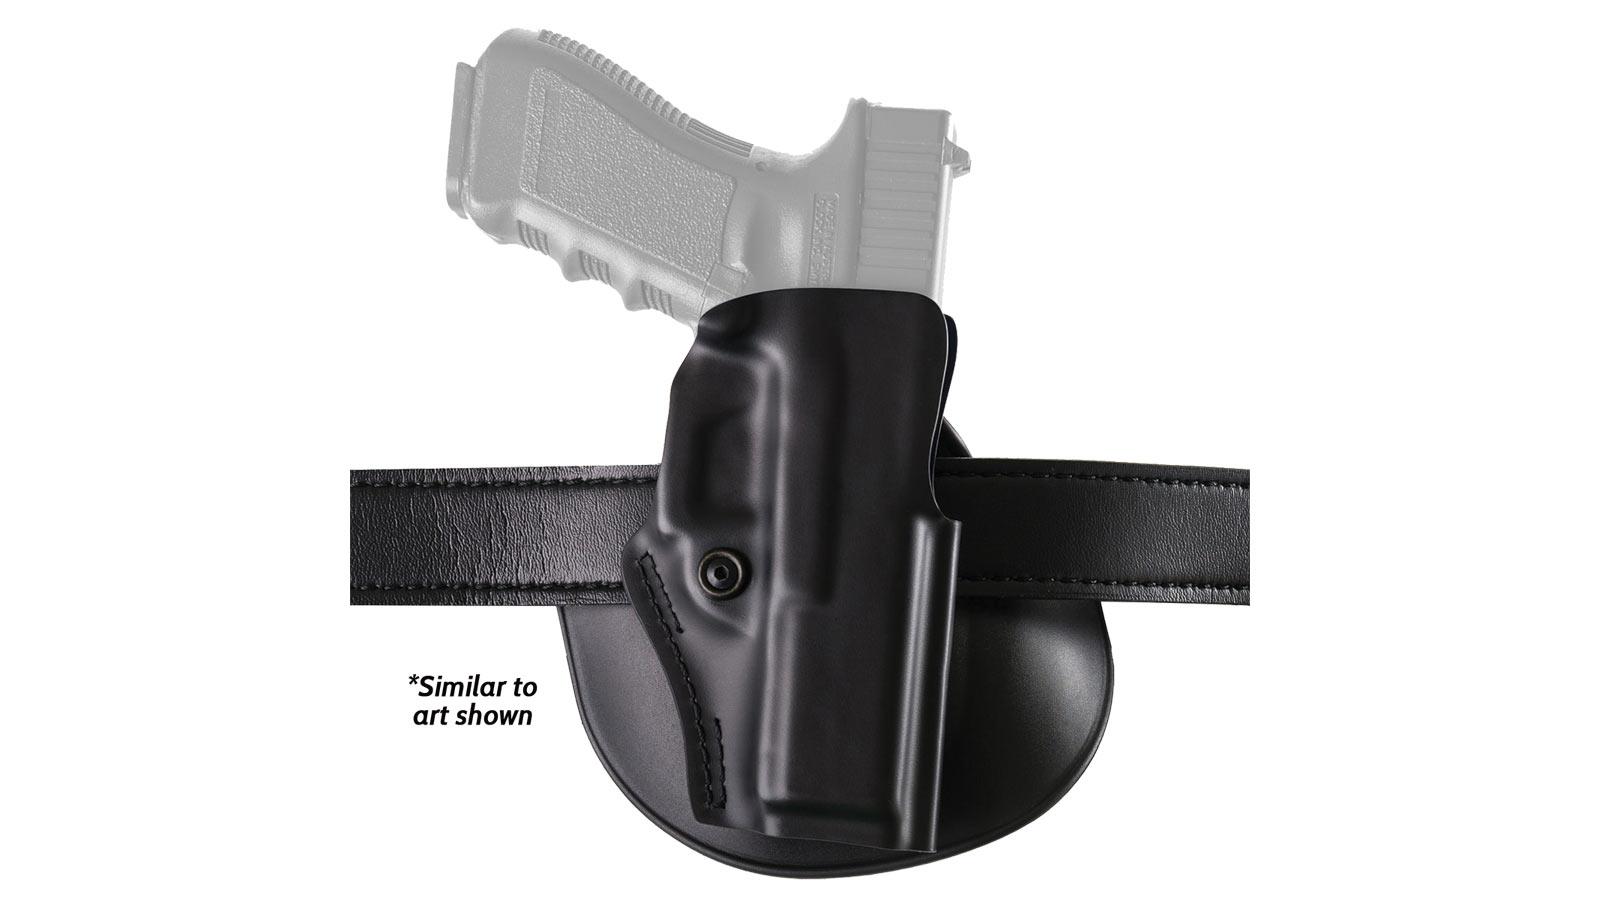 Safariland 5198283411 5198 Paddle Holster Glock 19|23 Thermoplastic Black